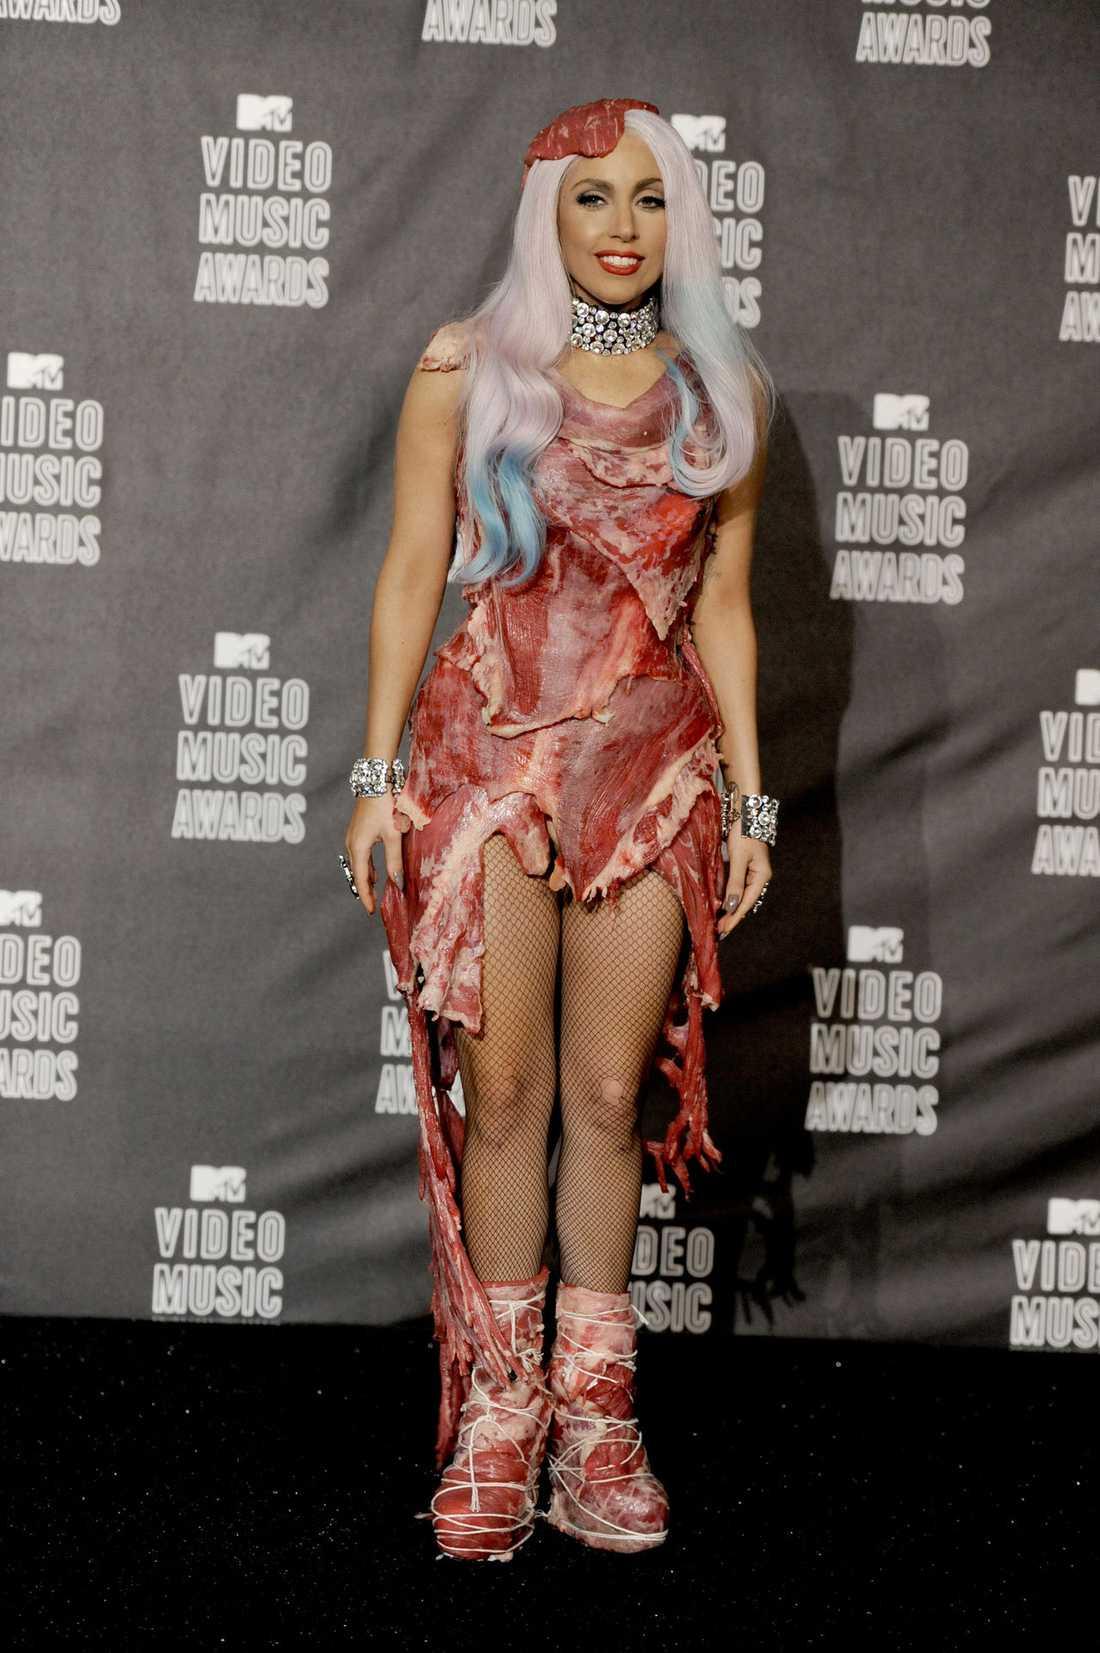 MTV Video Music Awards 2010.